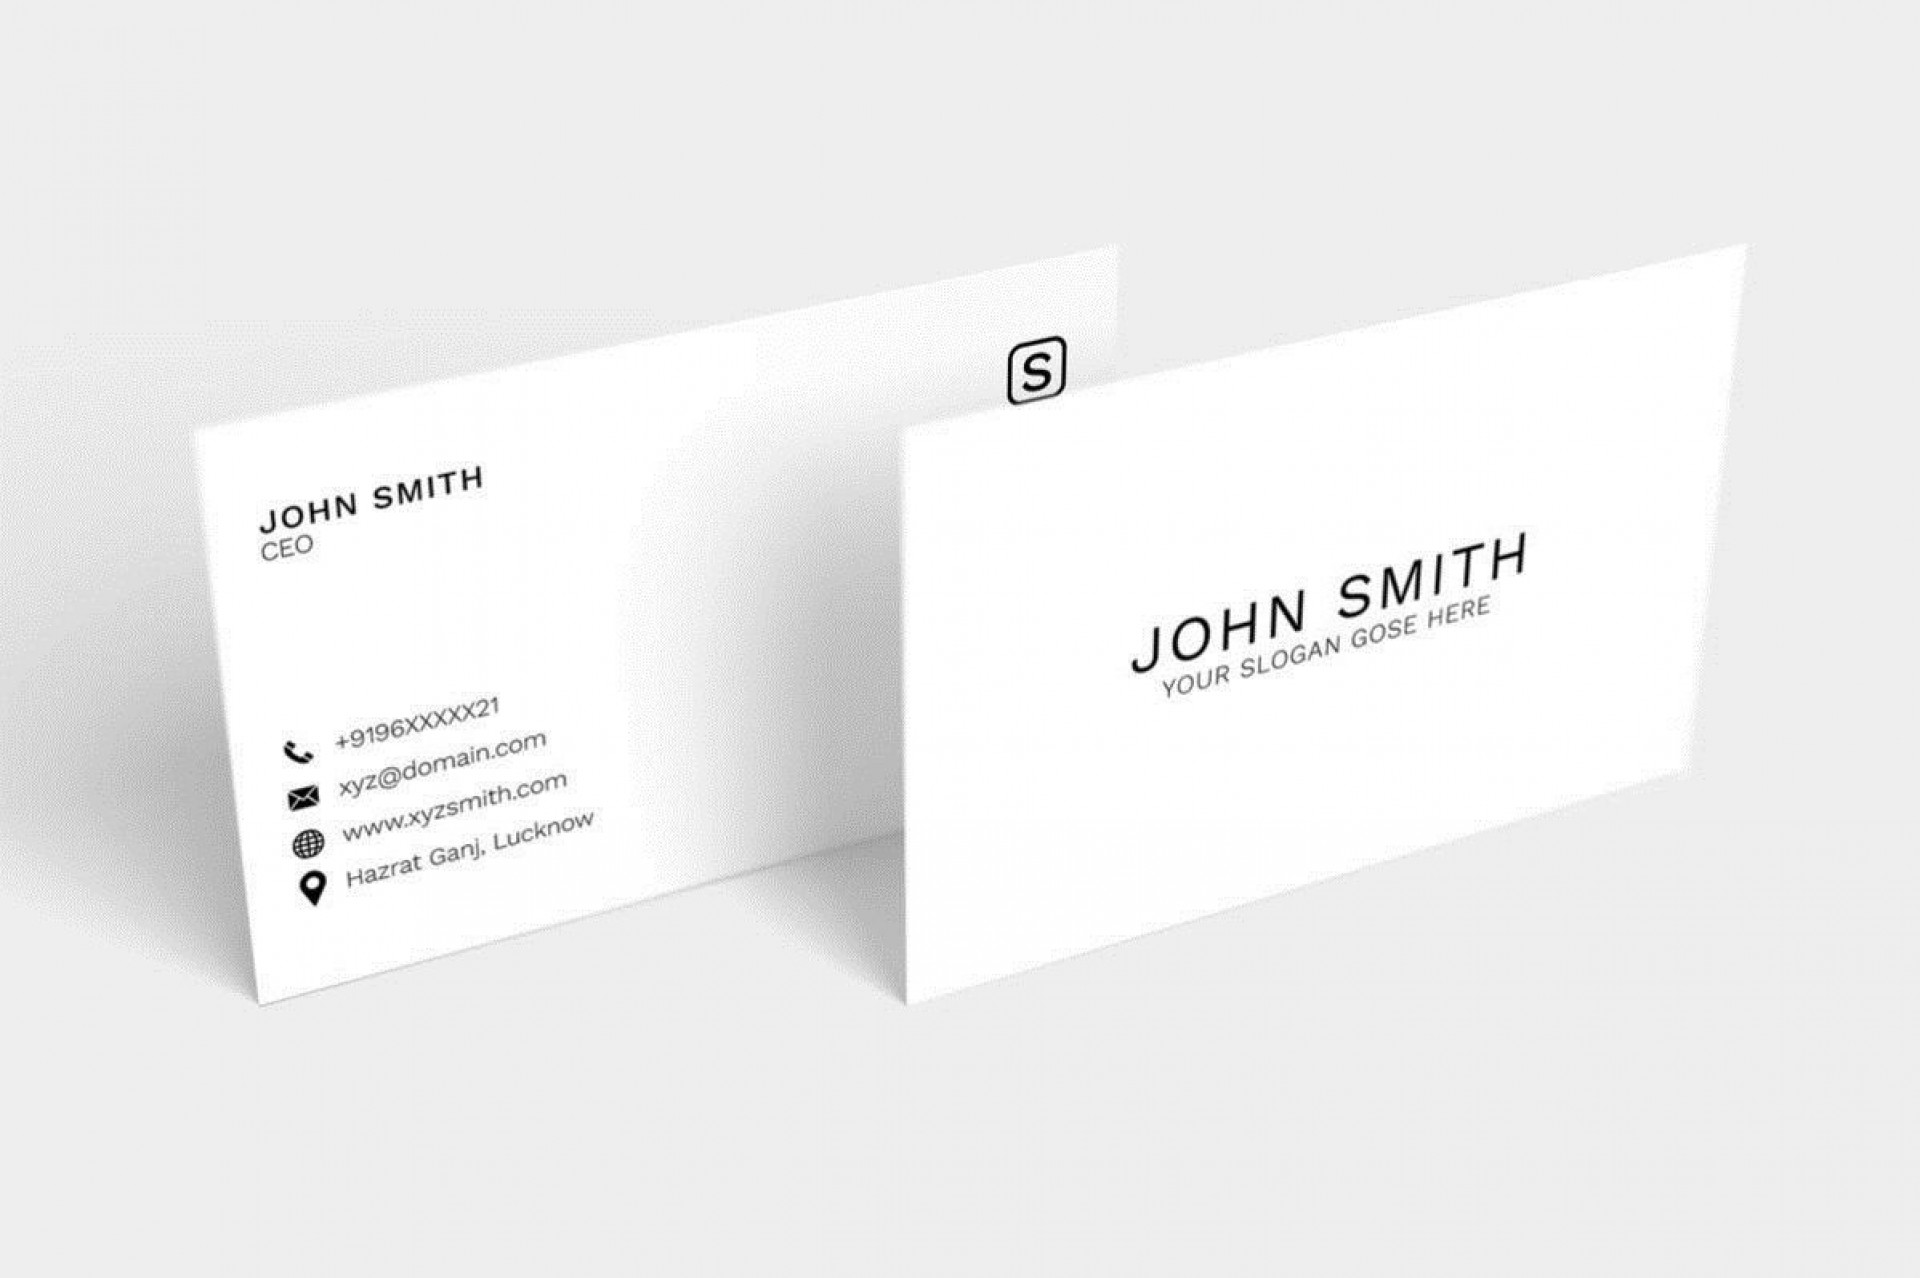 008 Impressive Simple Busines Card Design Template Free Picture  Minimalist Psd Visiting File Download1920